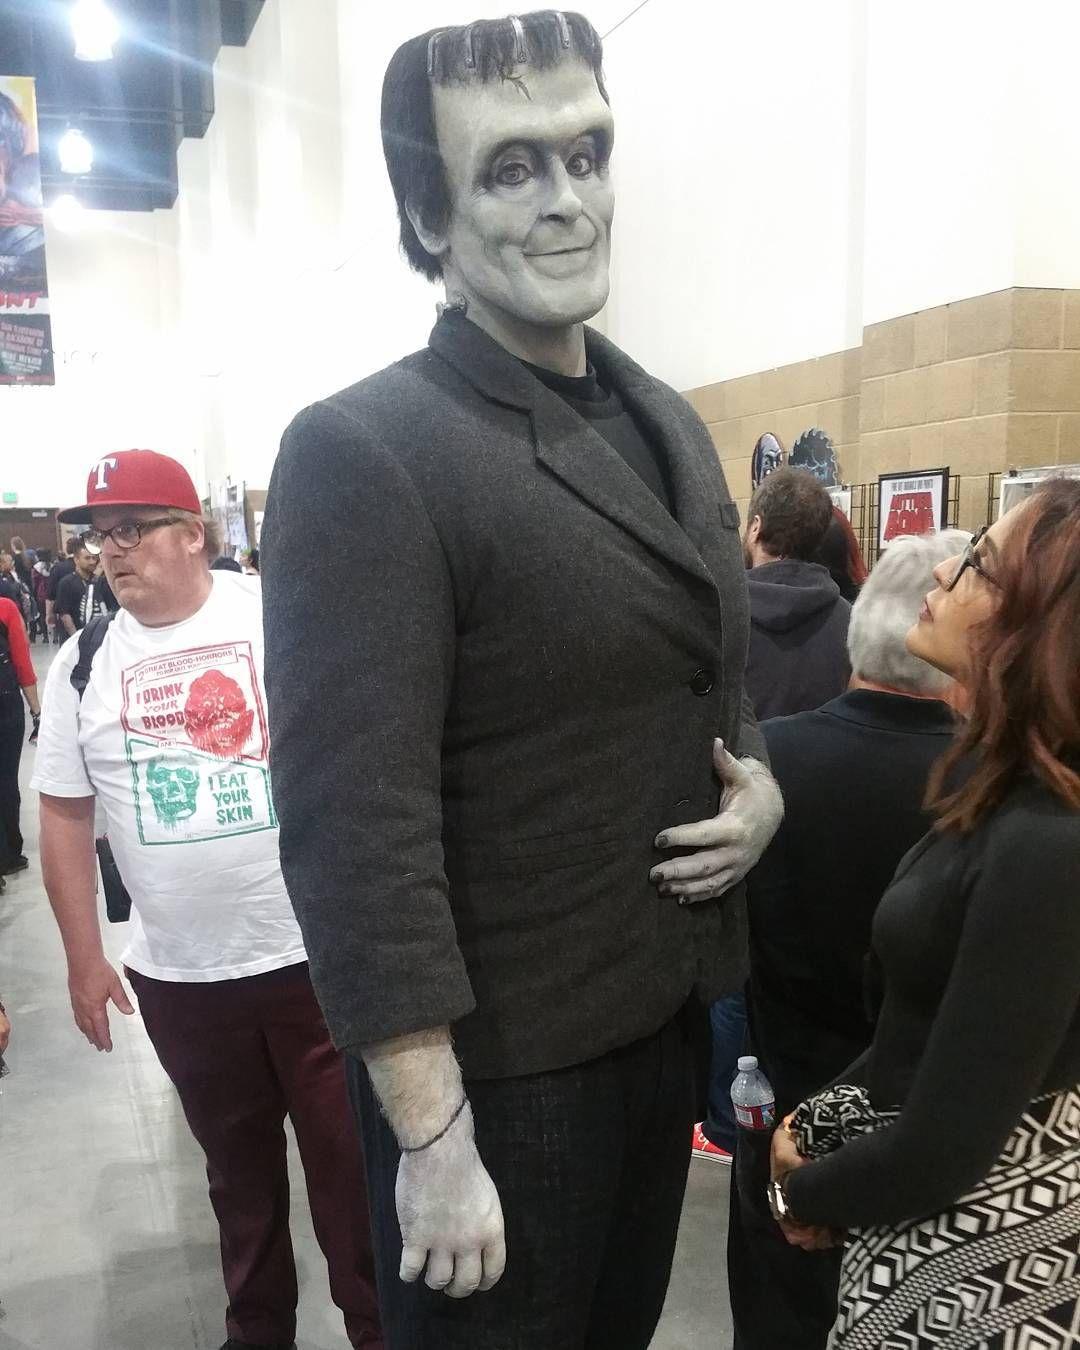 Diy Frankenstein Costume Scary Images Tutorial Maskerix Com Monster Costumes Halloween Costume Monster Frankenstein S Monster